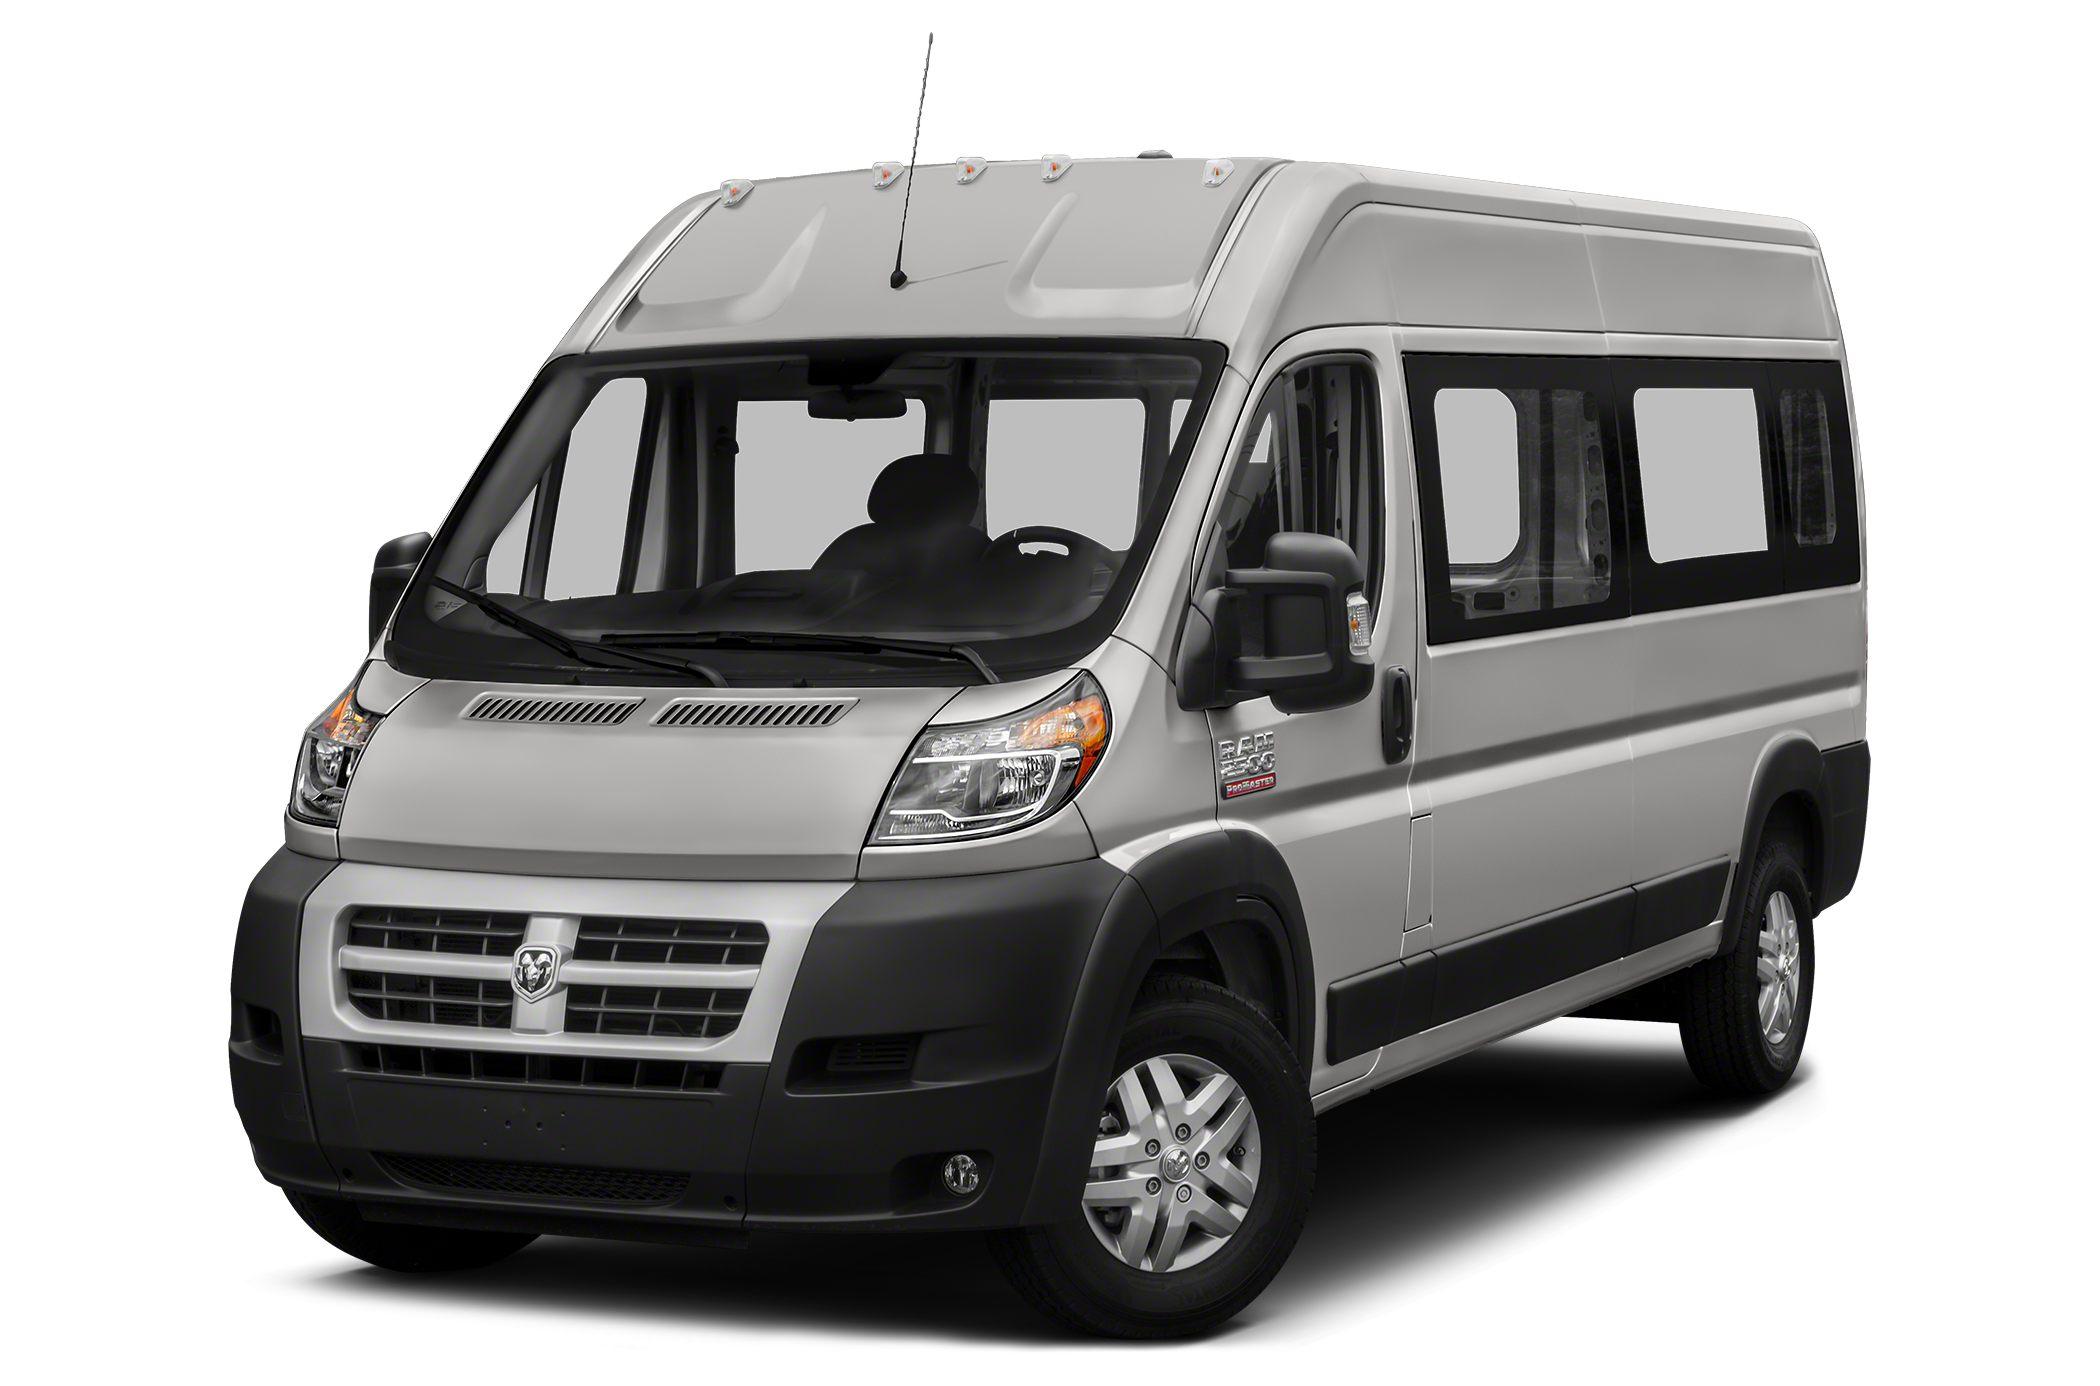 2018 RAM ProMaster 3500 Window Van Pictures & Photos - CarsDirect